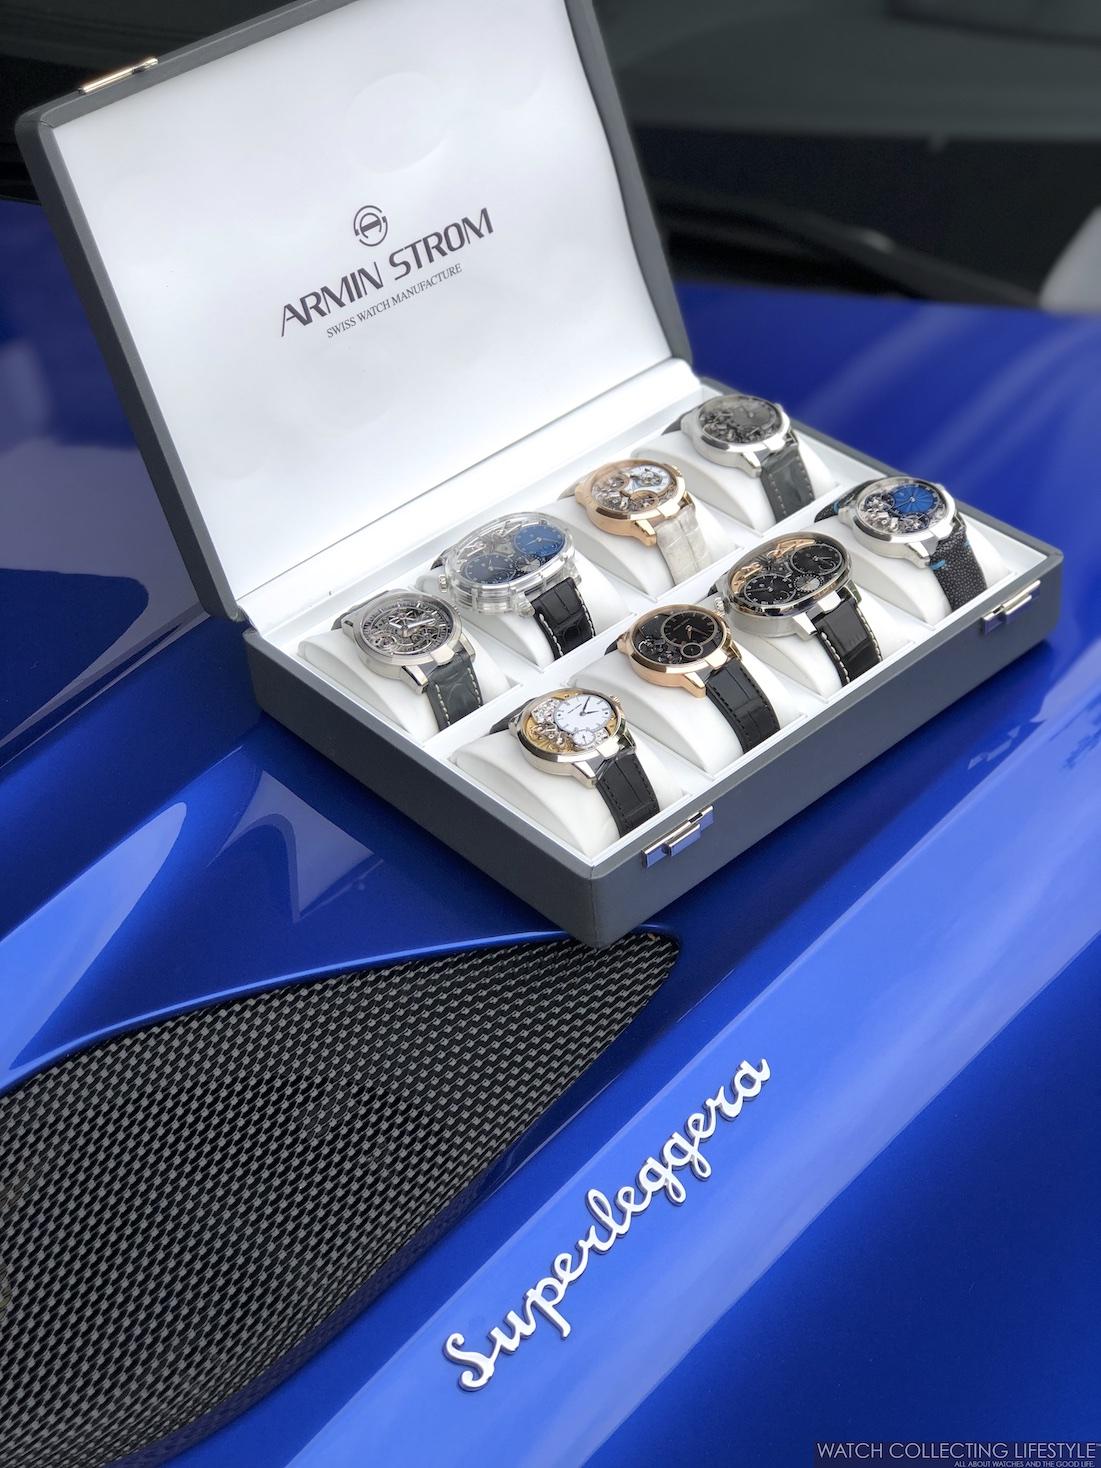 Aston Martin DBS Superleggera and Armin Strom